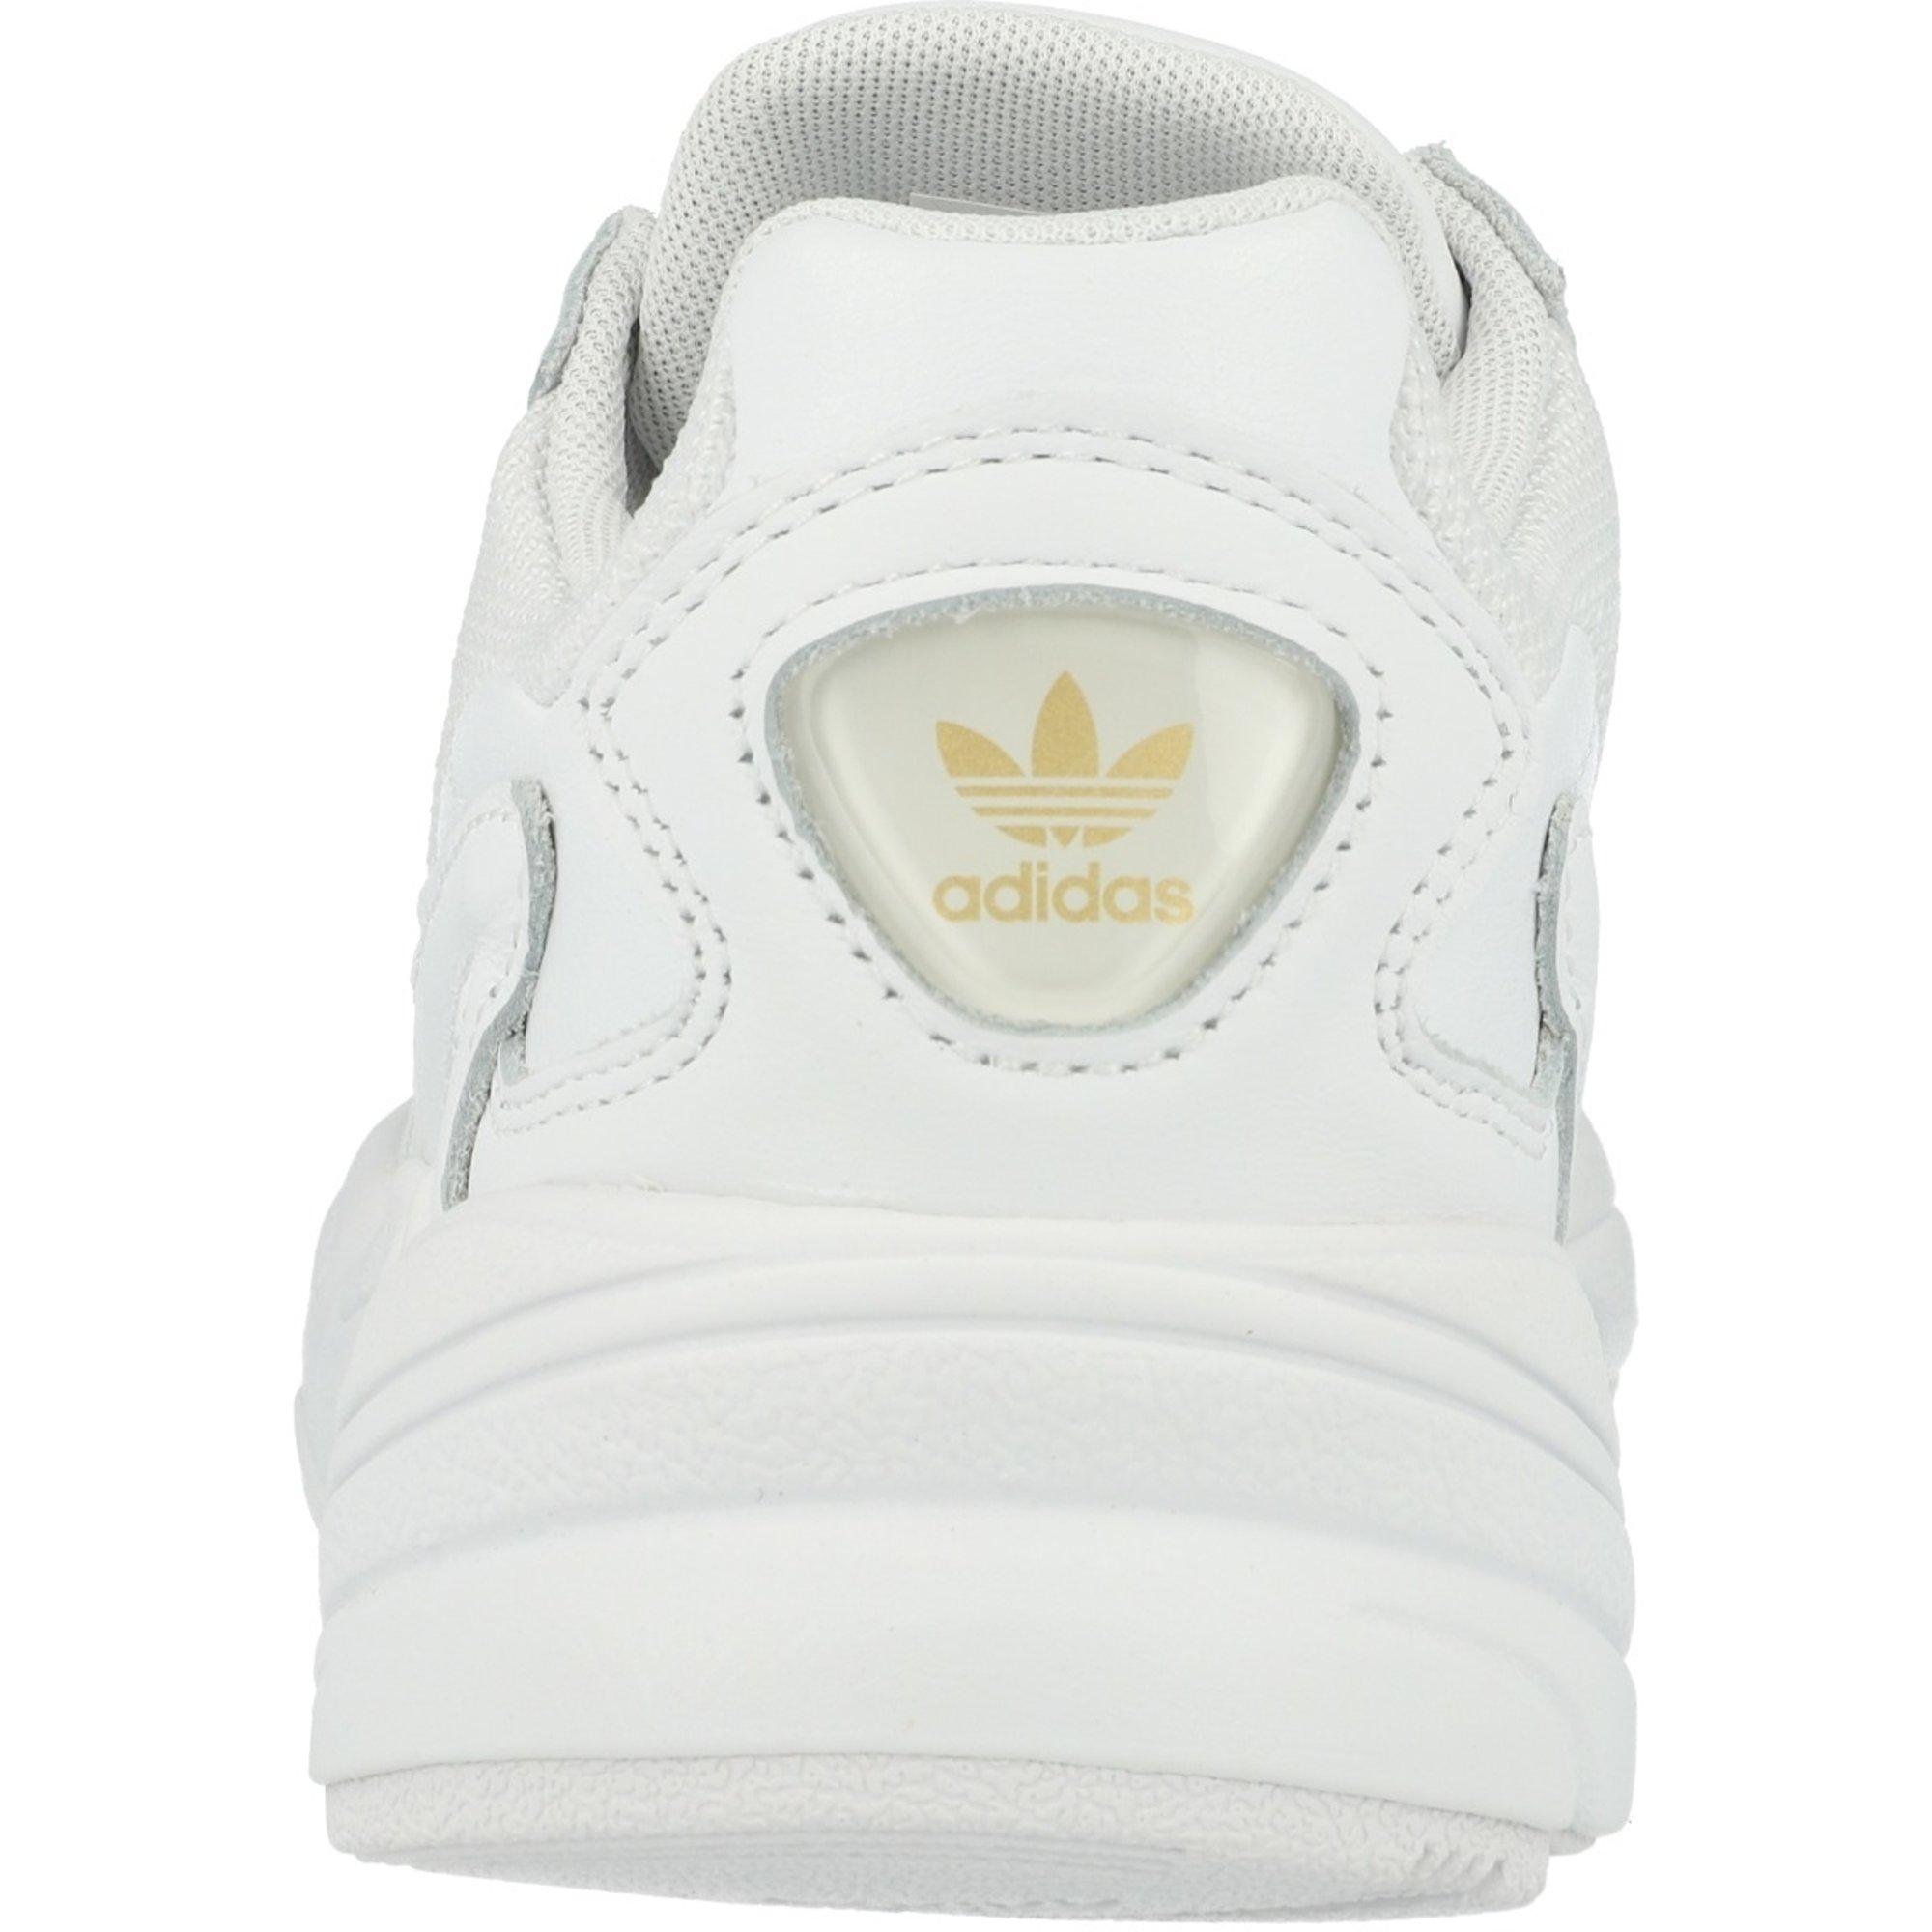 adidas Originals Falcon W White/Gold Metallic Leather Adult